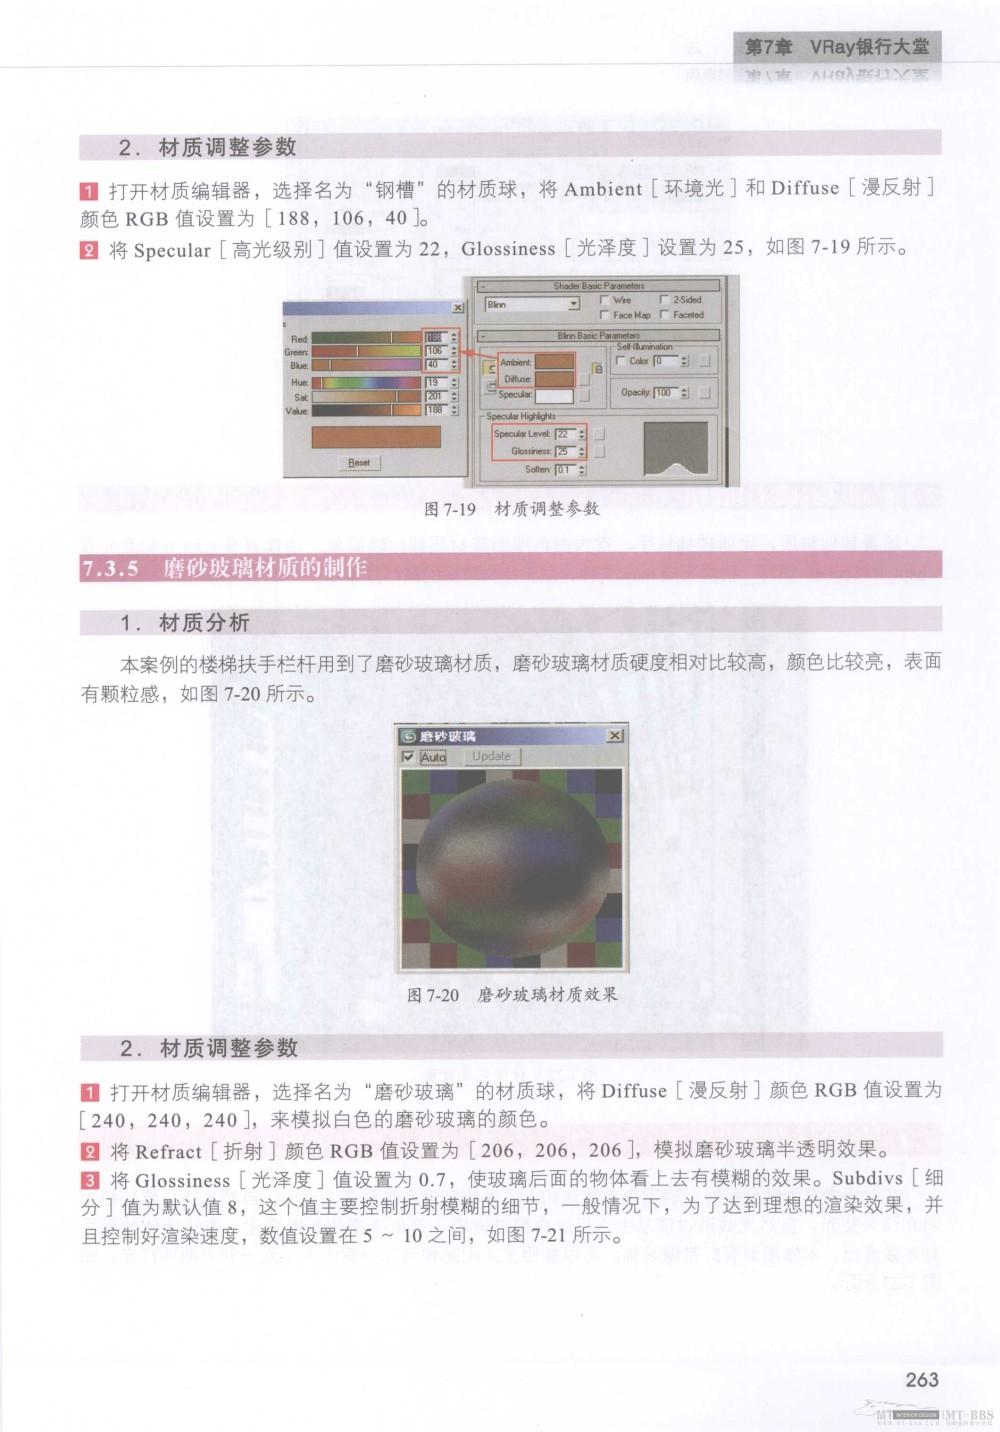 水晶石技法-3ds_Max&VRay室内空间表现_水晶石技法-3ds_Max&VRay室内空间表现_页面_269.jpg